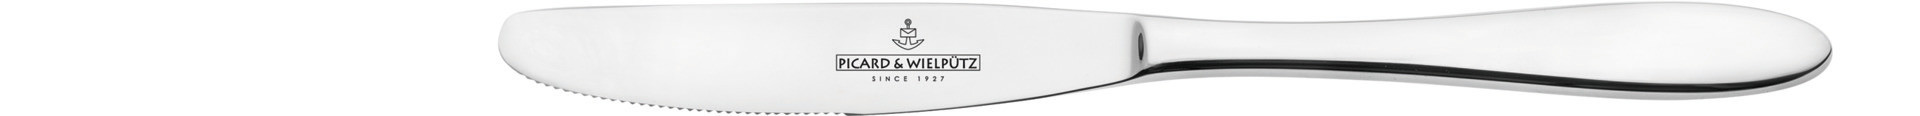 Bozen, Dessertmesser Monoblock 205 mm poliert